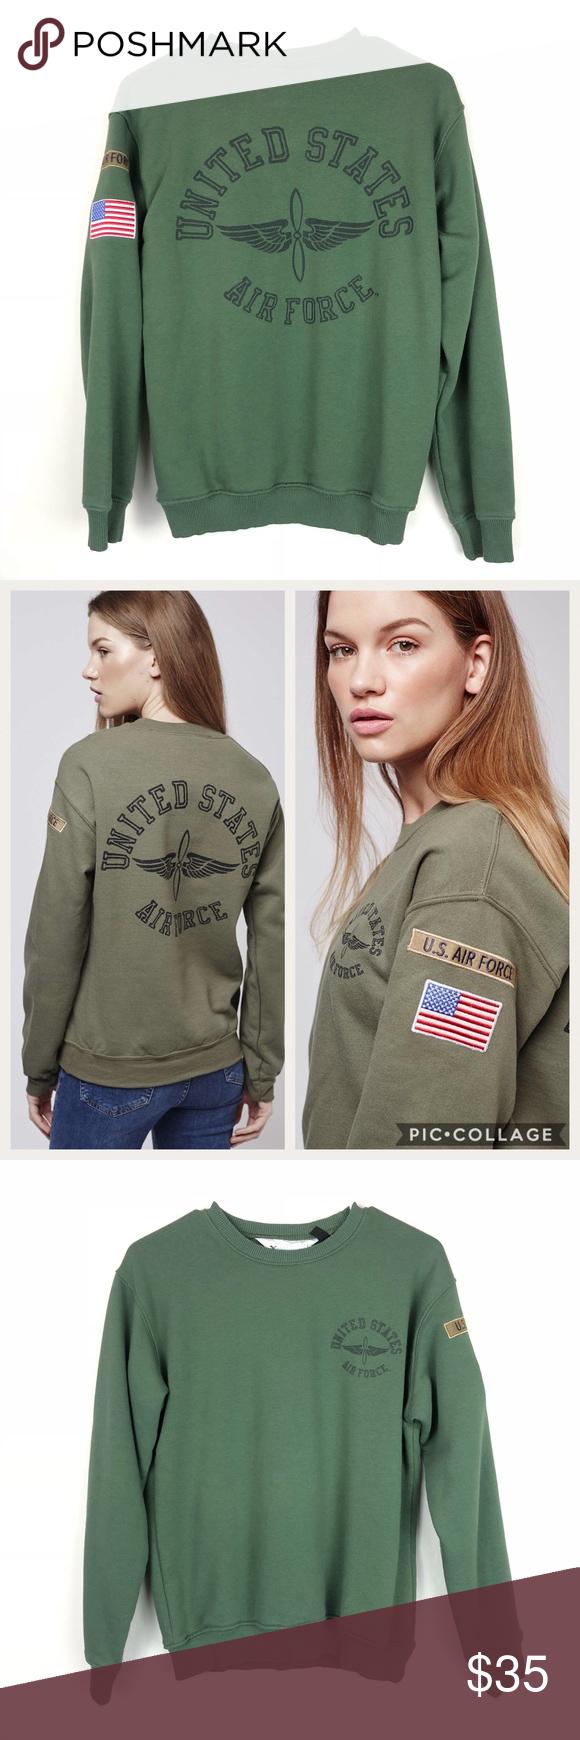 Topshop United States Air Force Crewneck Sweater Crew Neck Sweater Sweaters Topshop [ 1740 x 580 Pixel ]